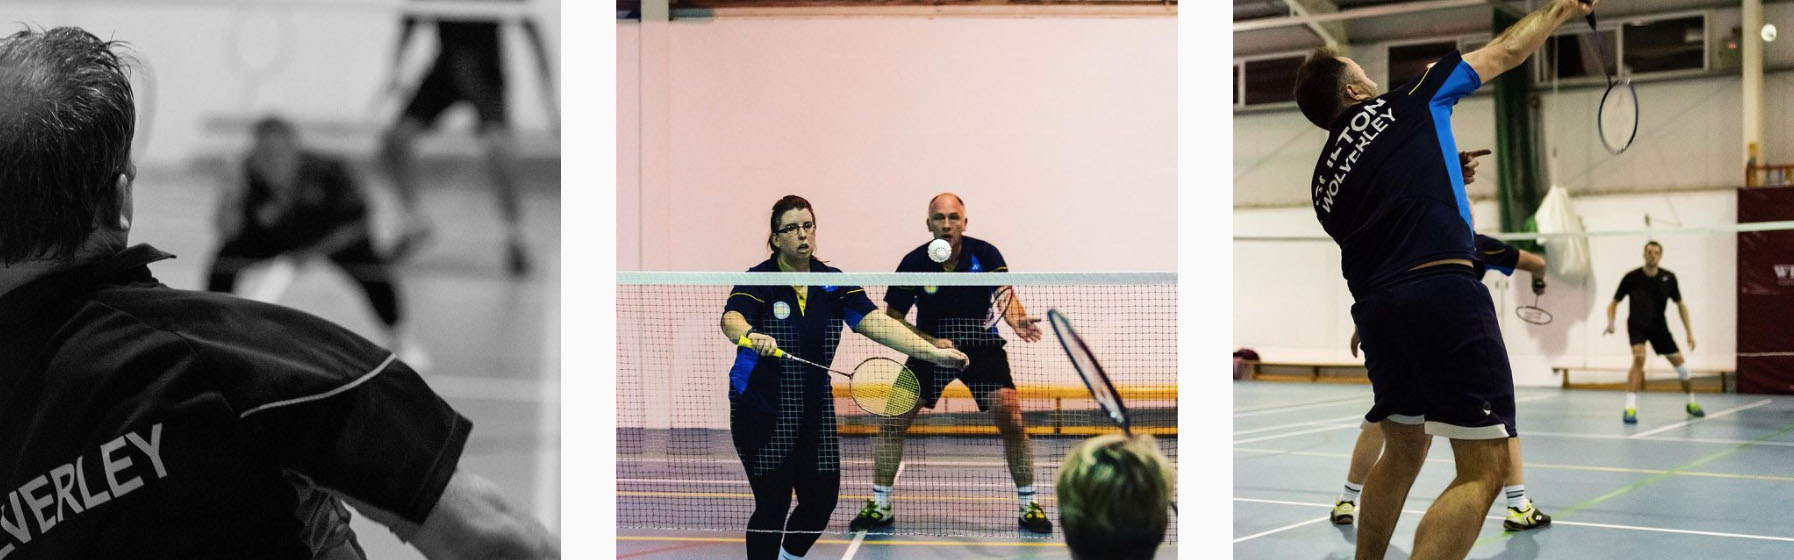 Aboyt Wolverley Badminton